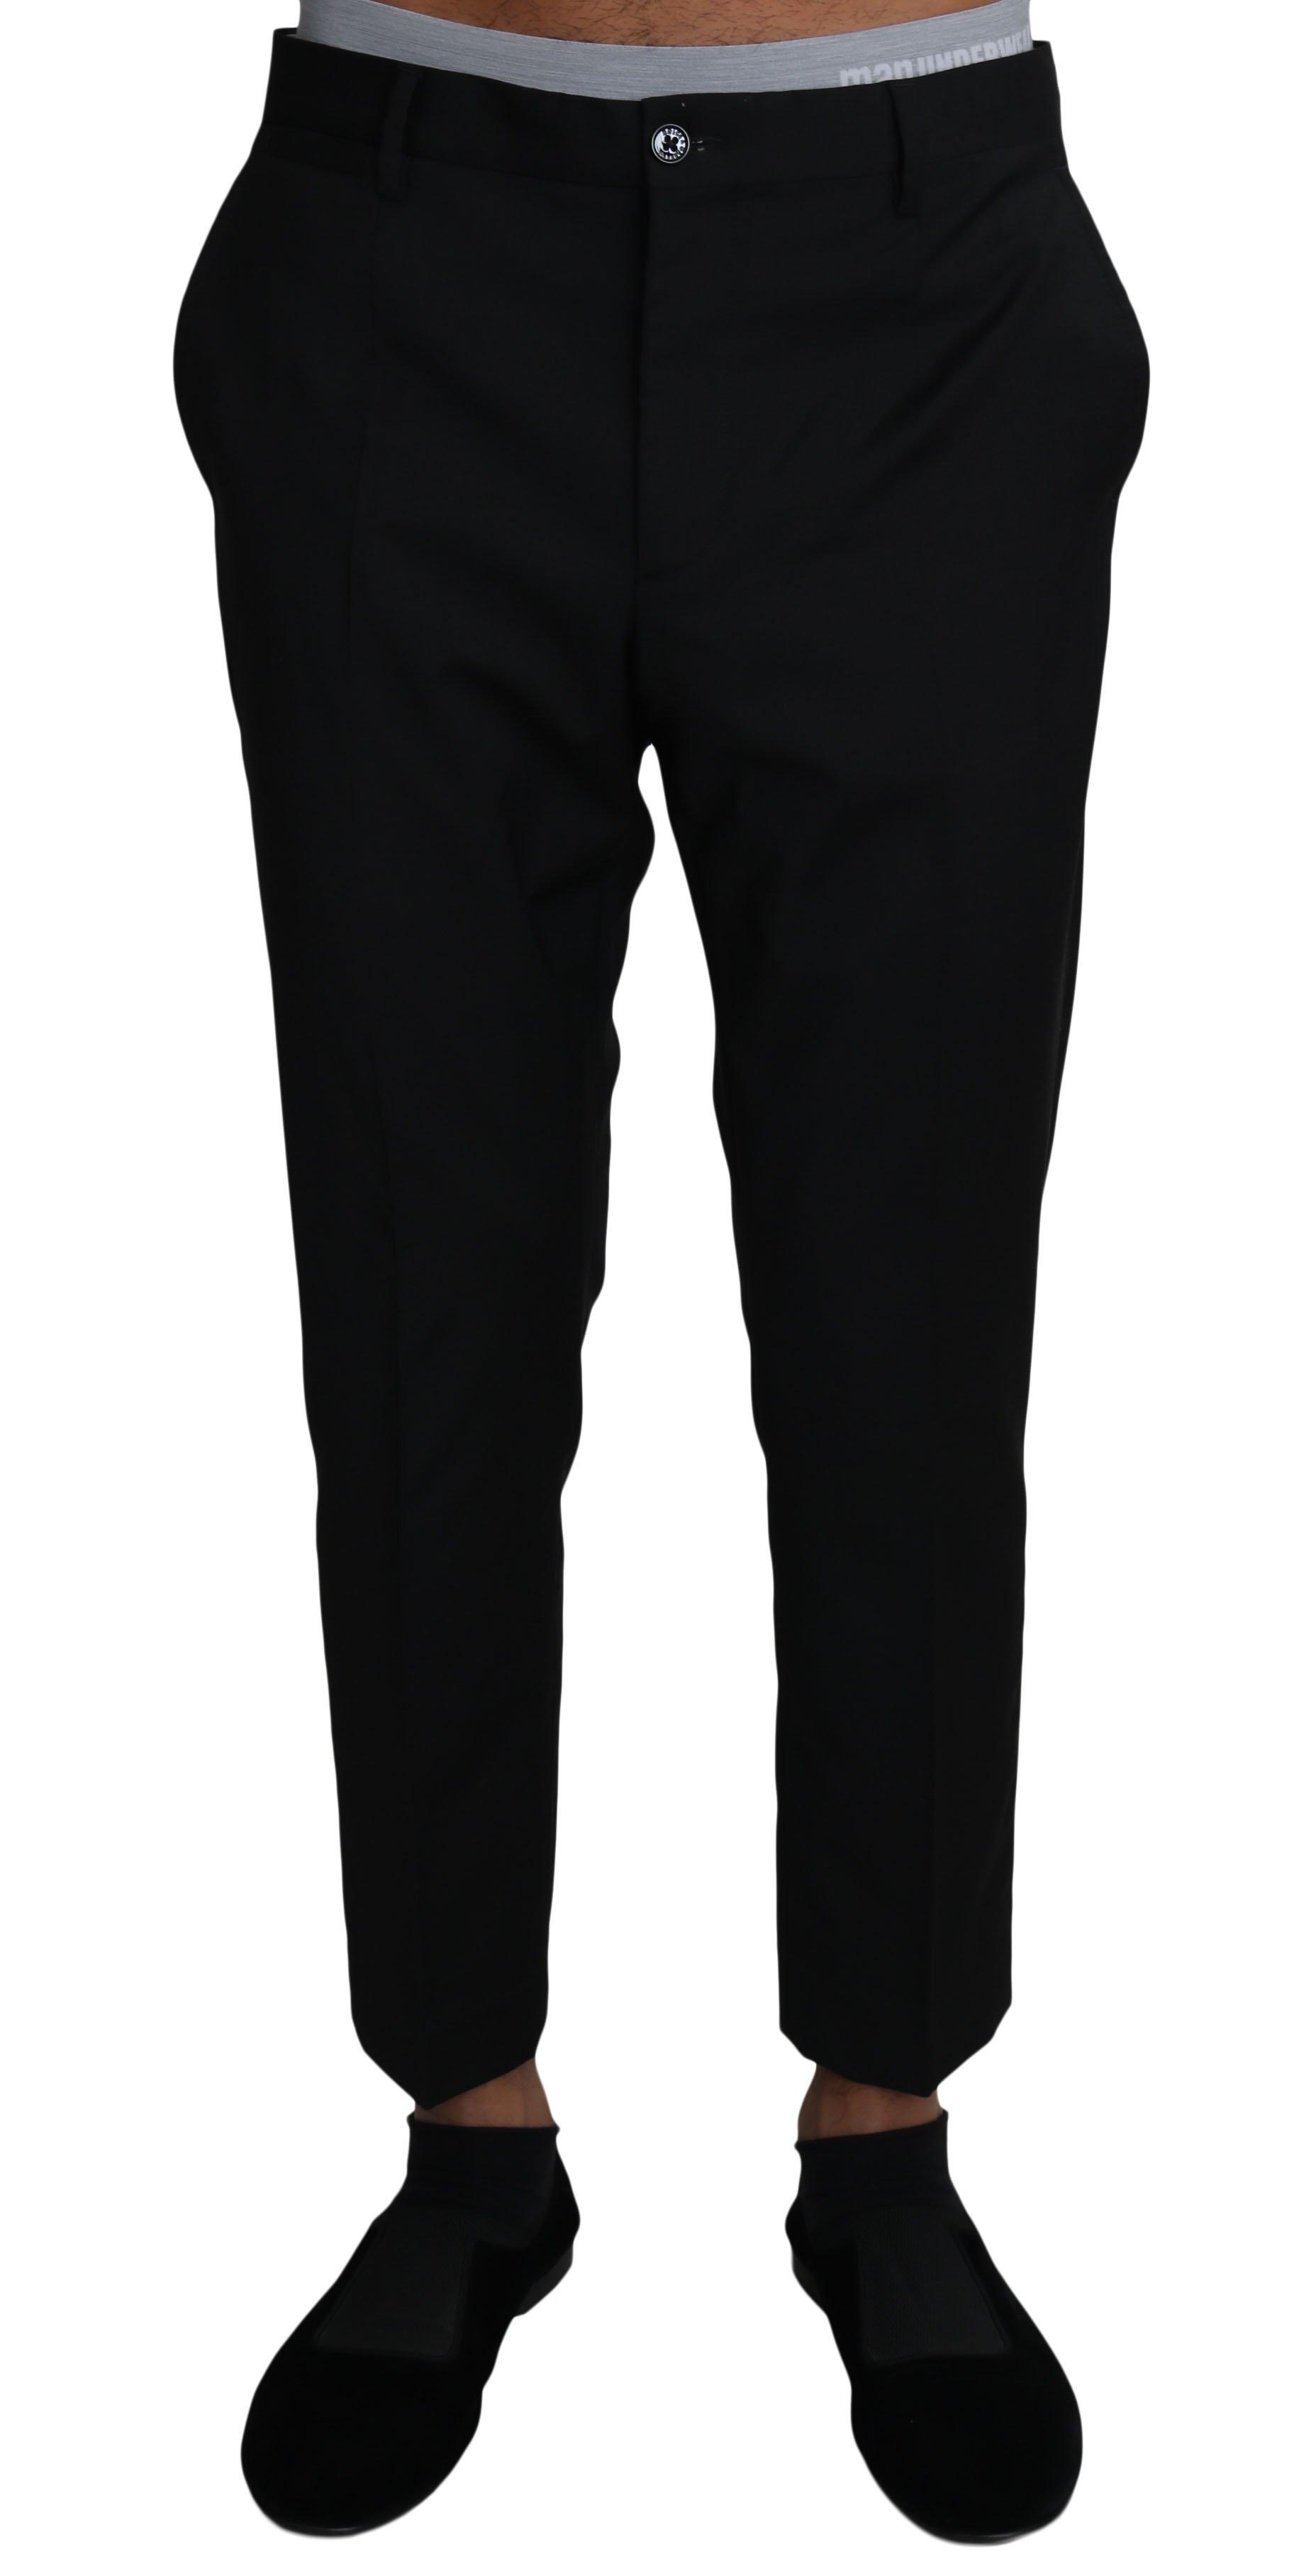 Dolce & Gabbana Men's Wool Formal Trouser Black PAN61131 - IT46 | S